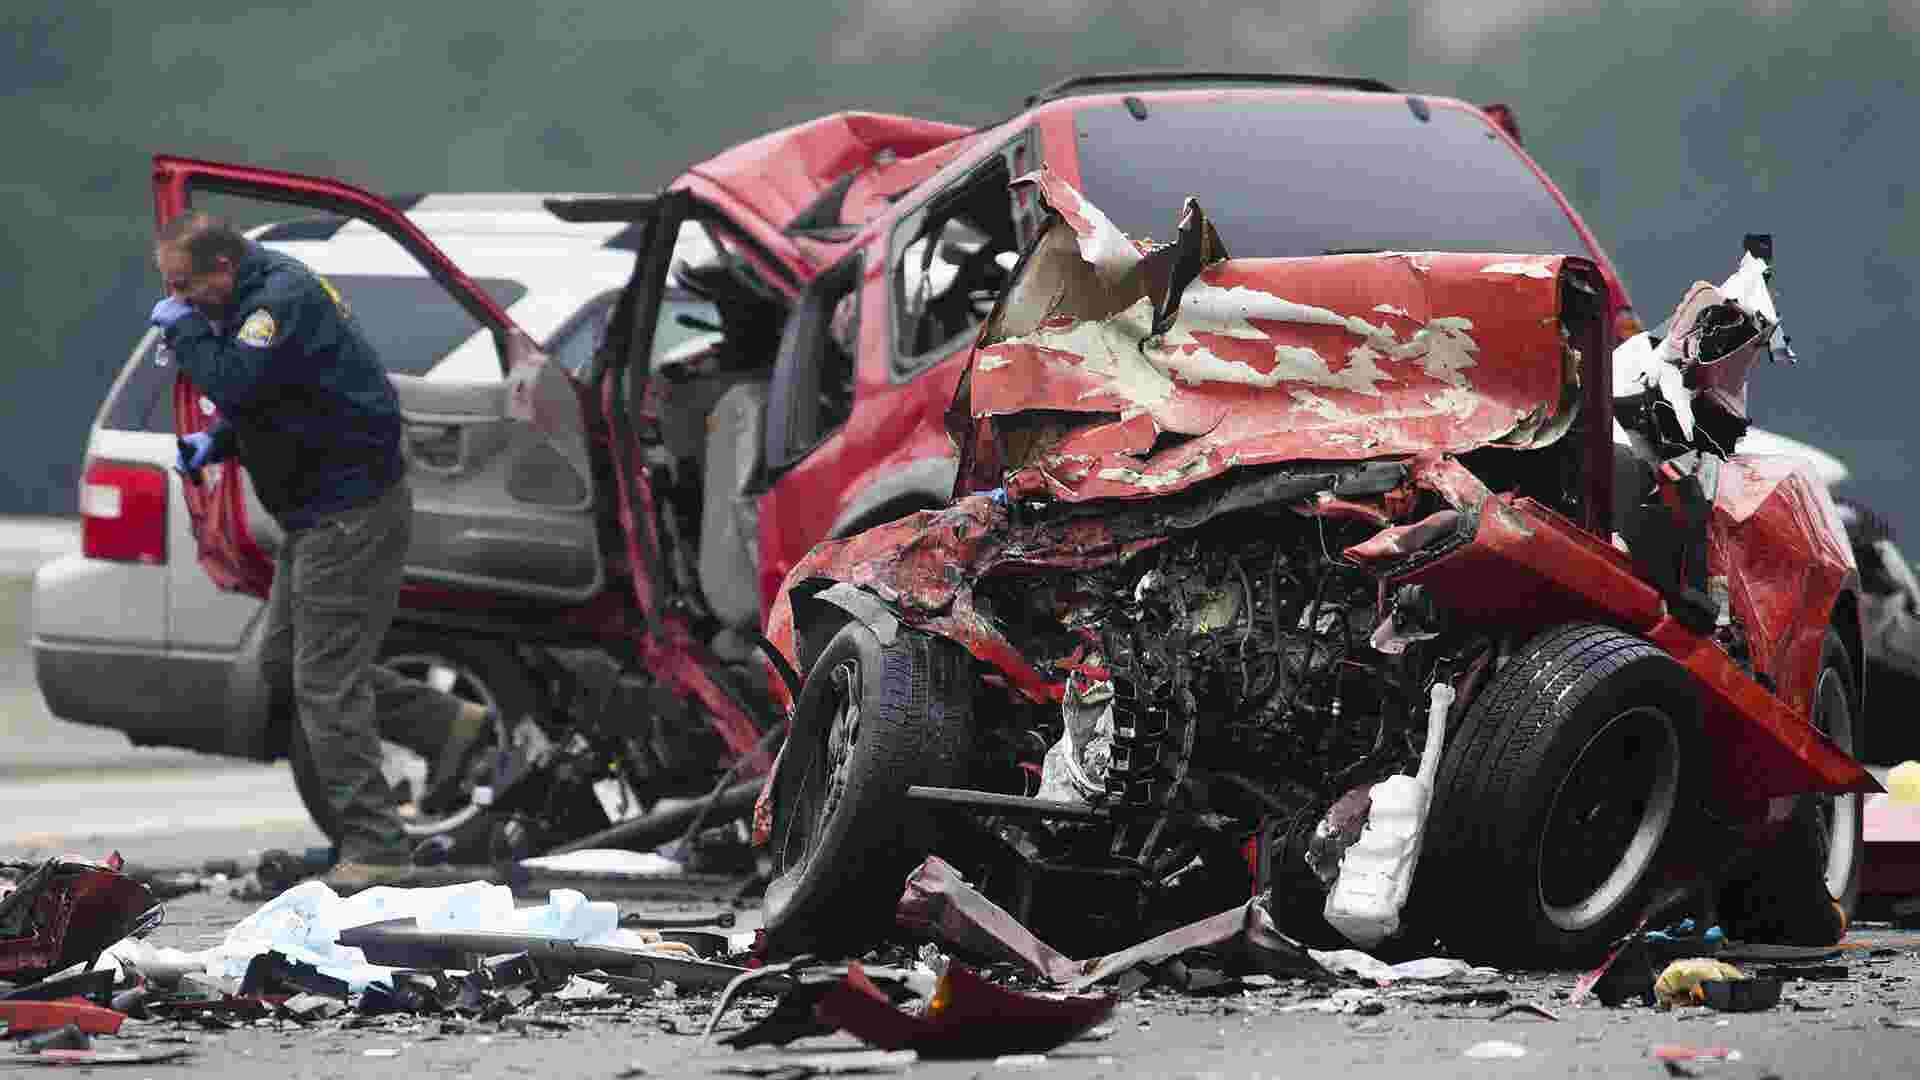 2 eerily similar crashes, 11 dead | USA NOW